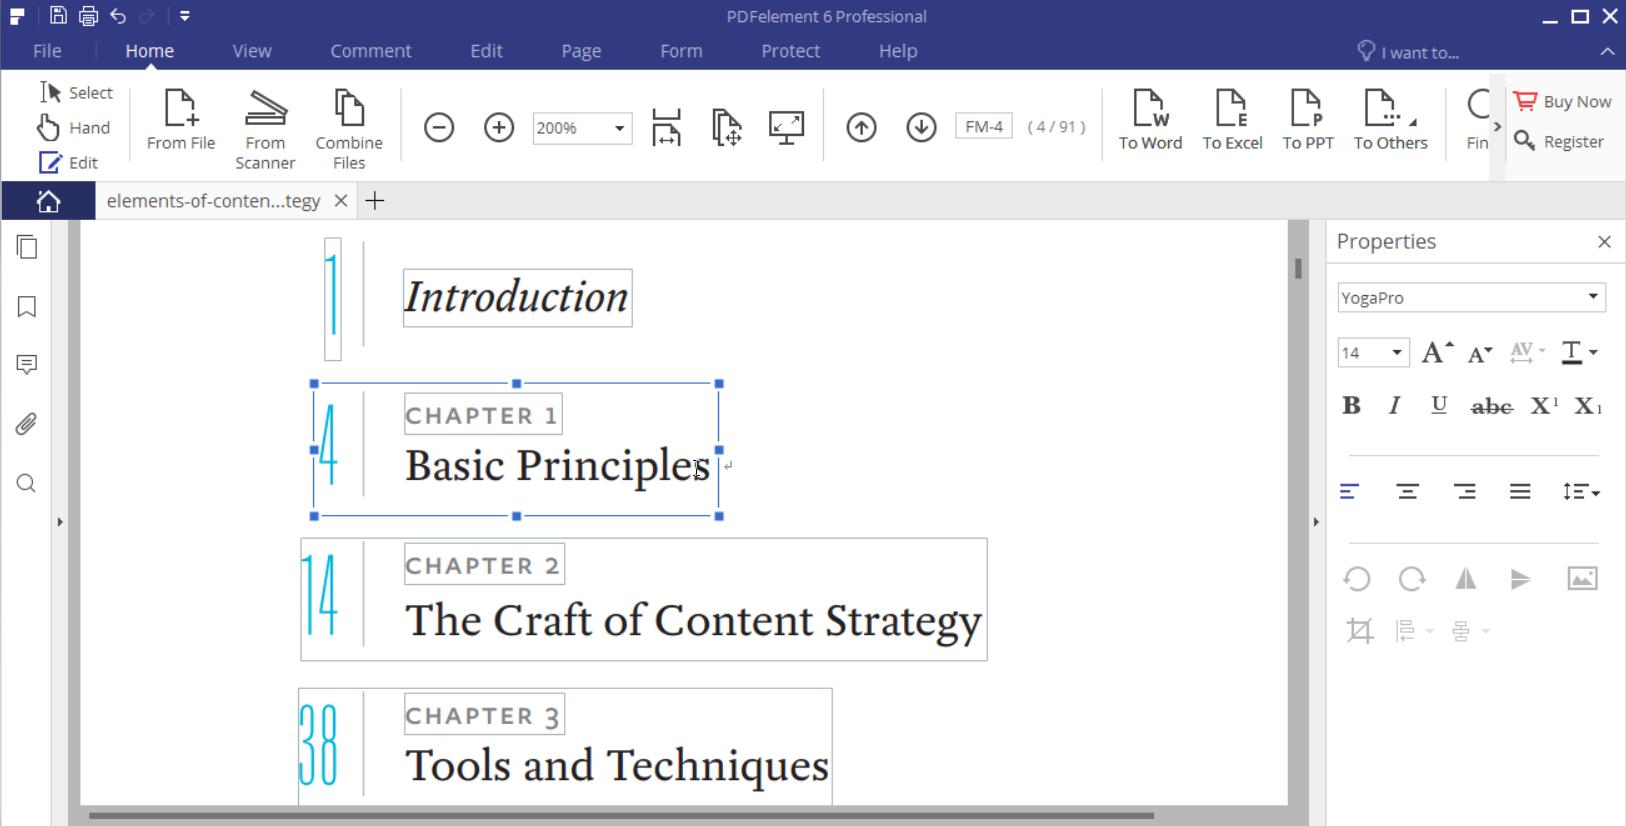 Pdf Editor Tools